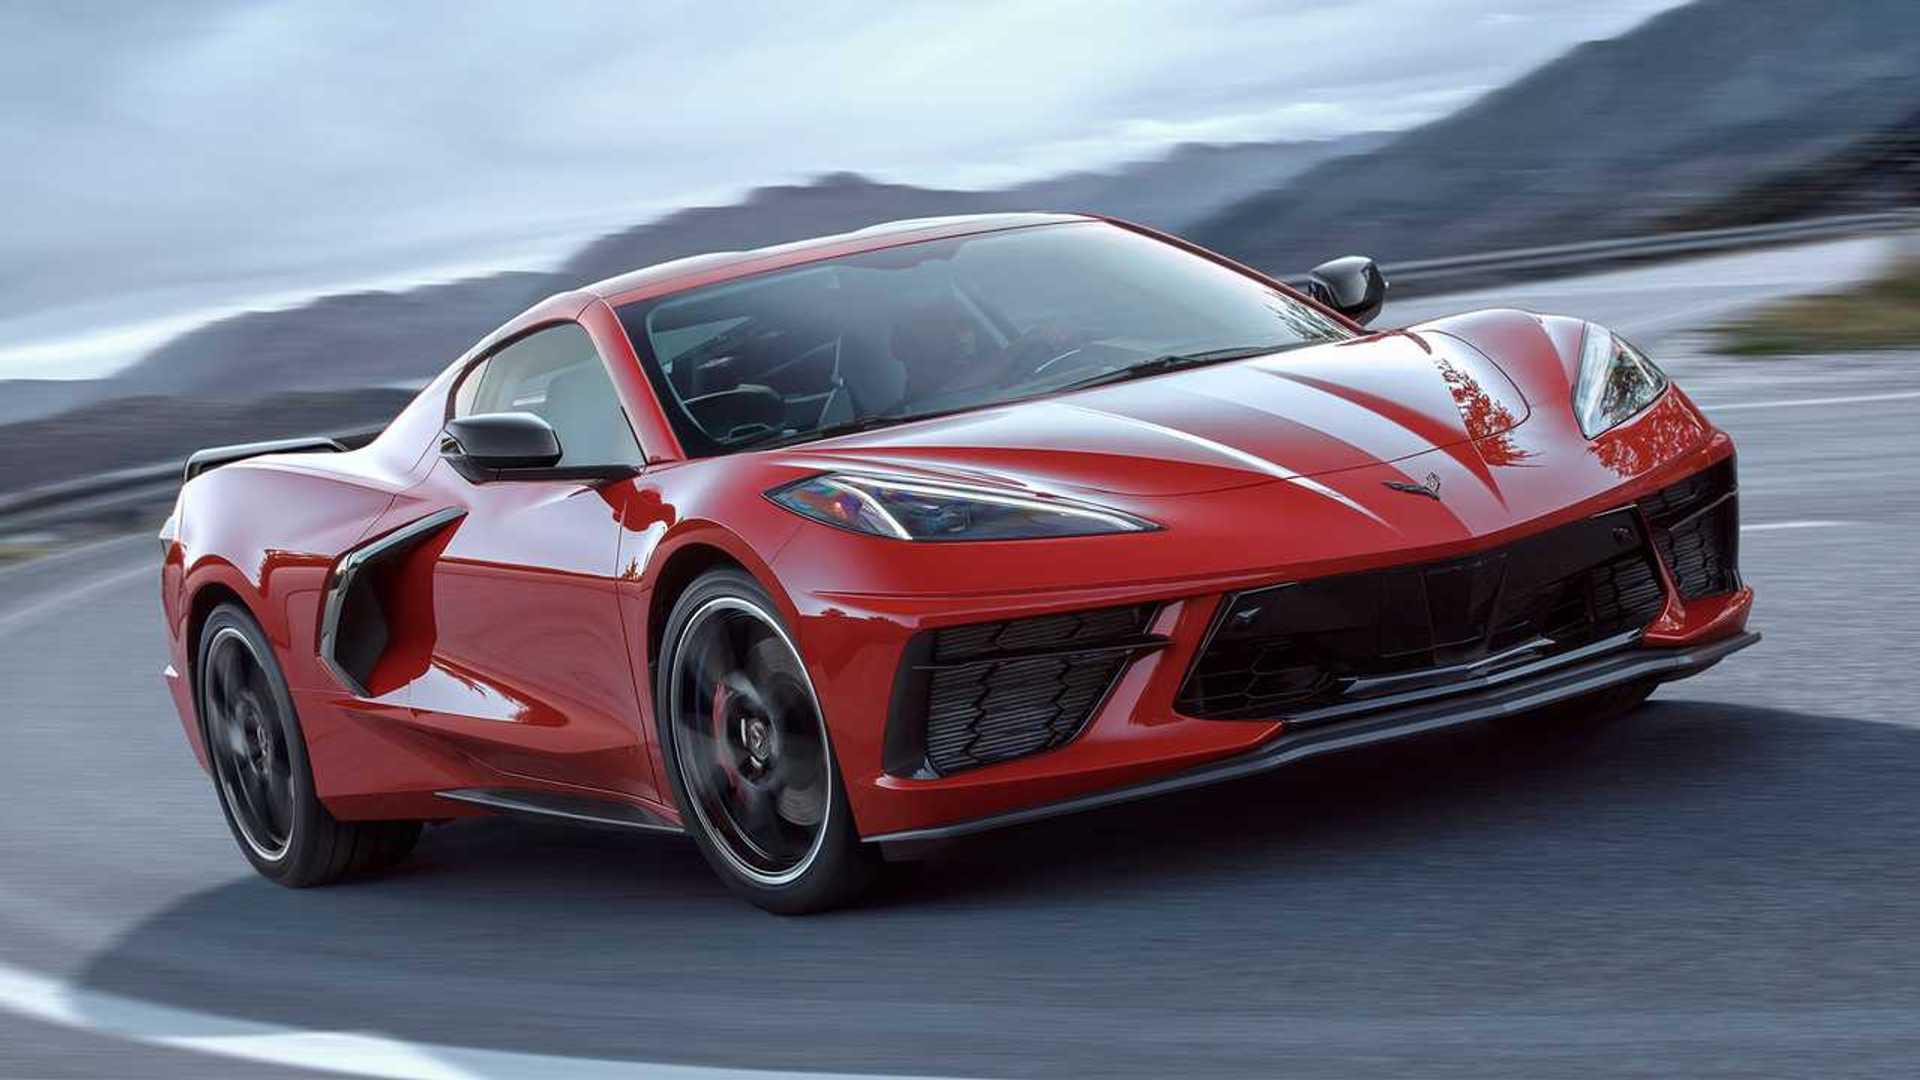 2020 Chevy Corvette Will Start Under $60,000